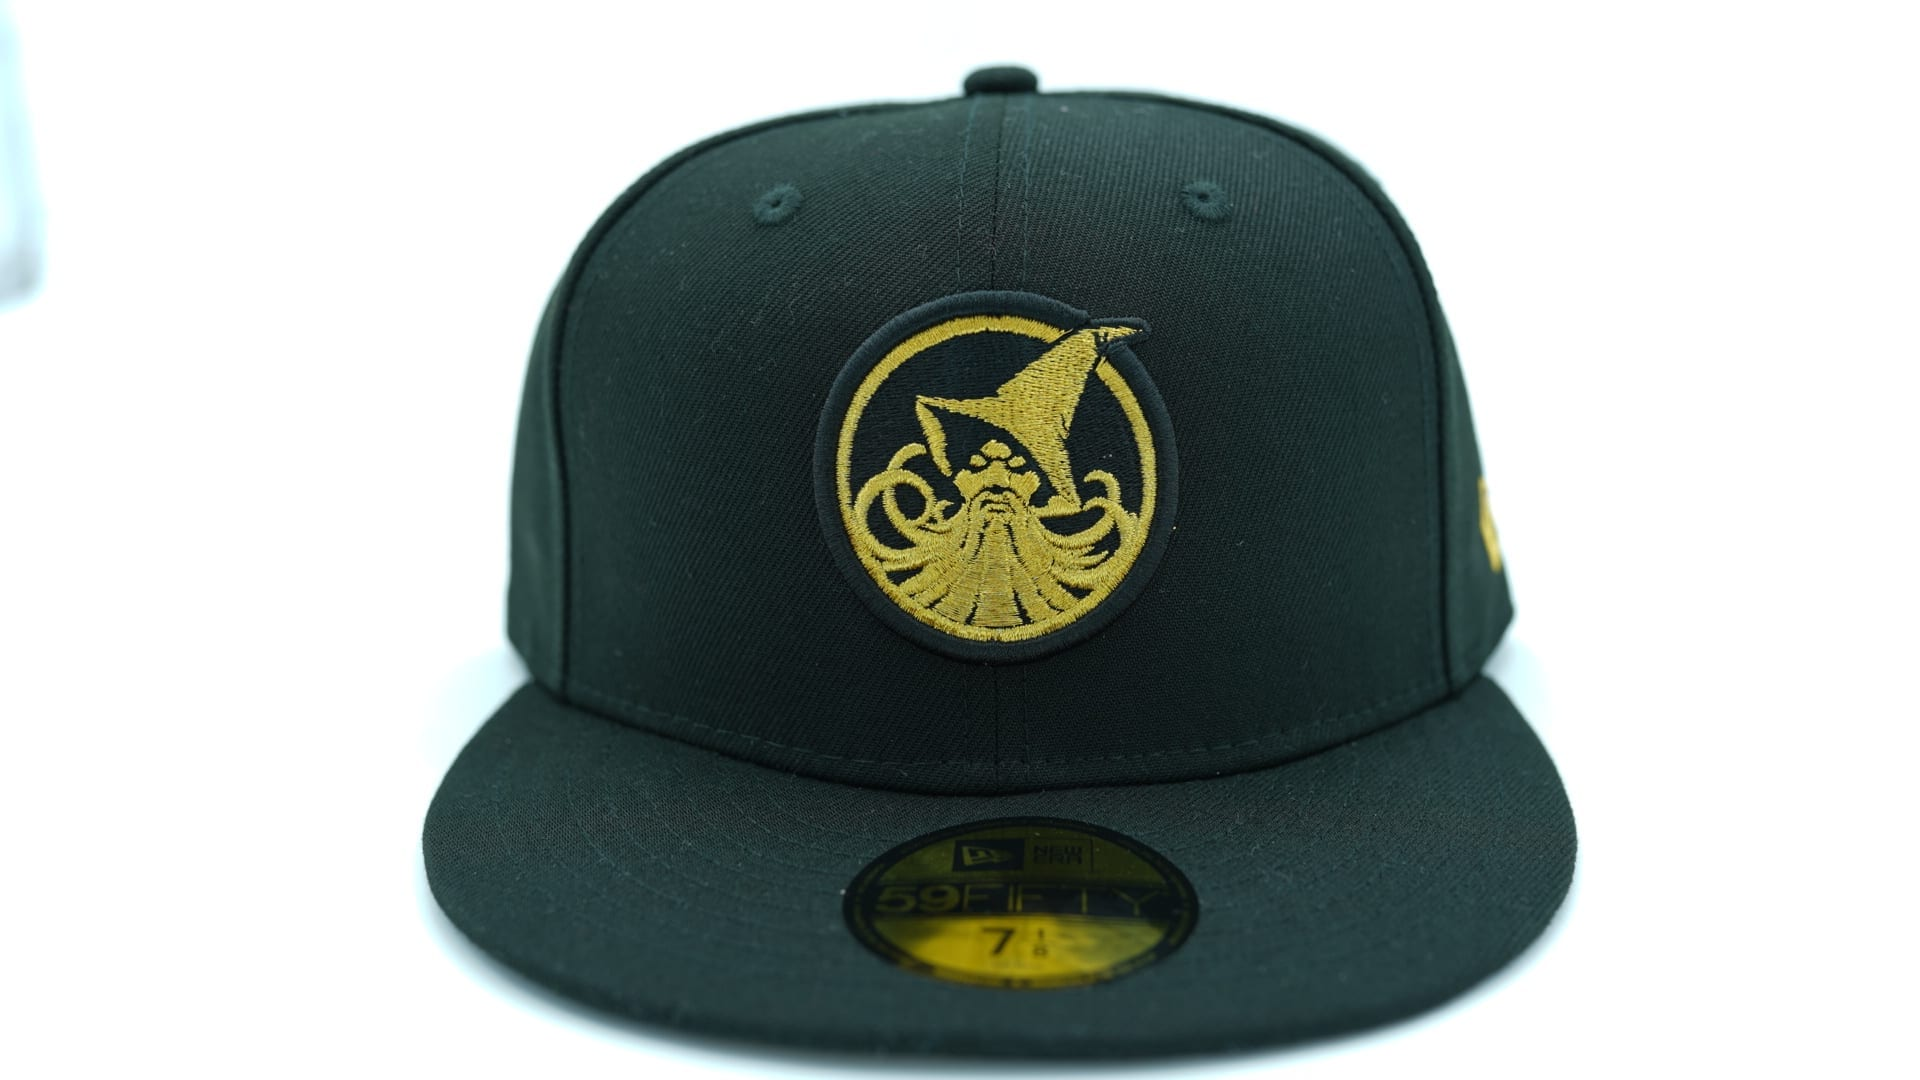 ... 50% off custom new york yankees sky blue 59fifty fitted baseball cap  new era mlb fff699201d3